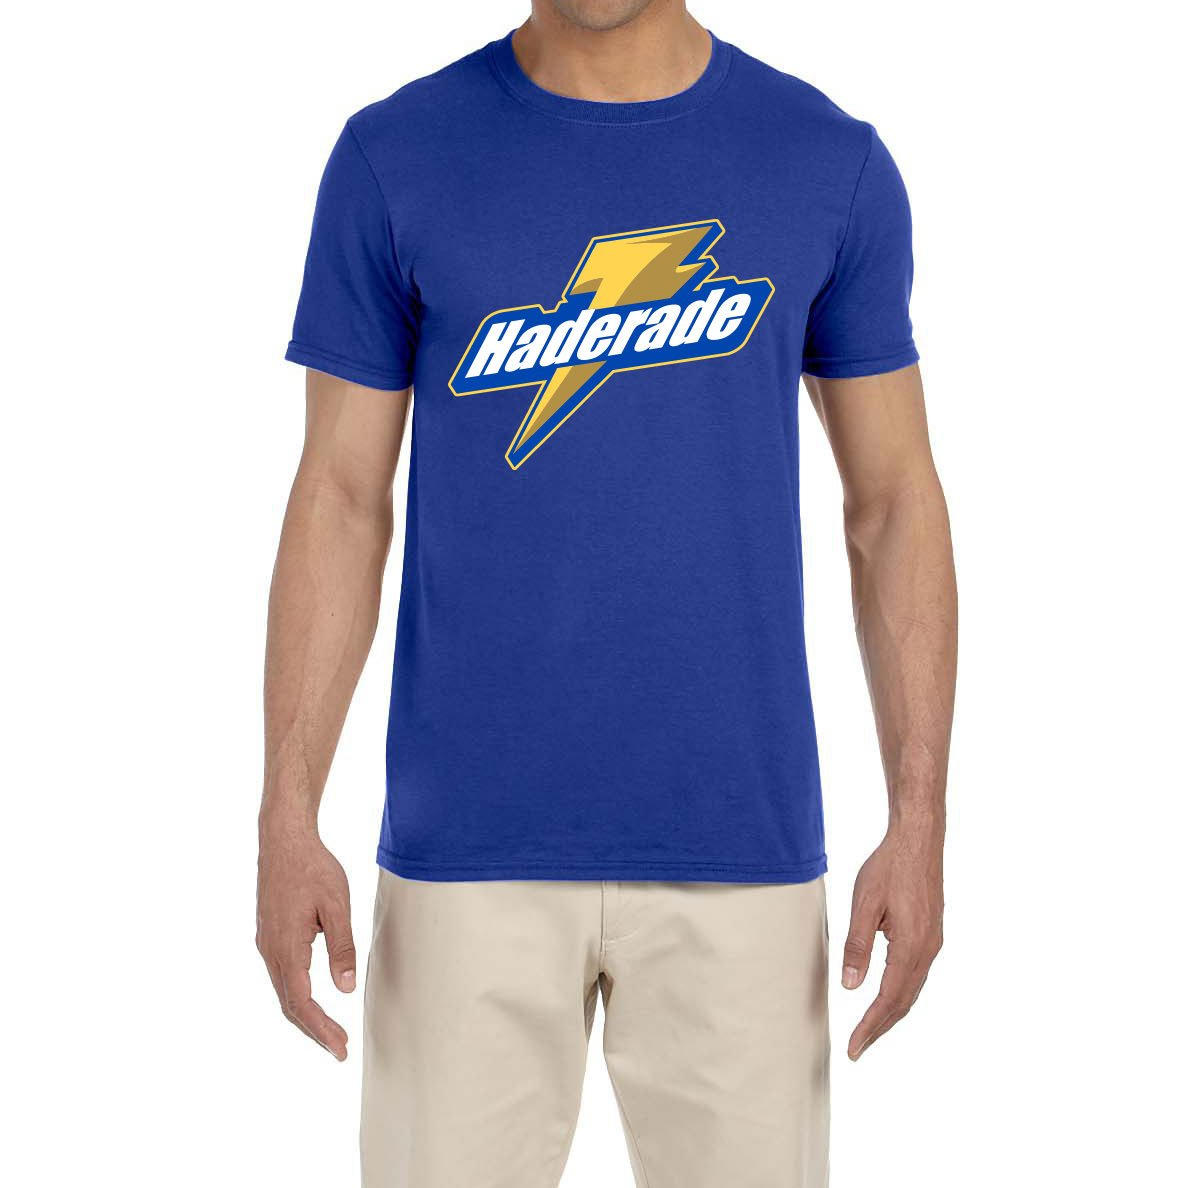 Tobin Clothing Navy Milwaukee Haderade T-Shirt